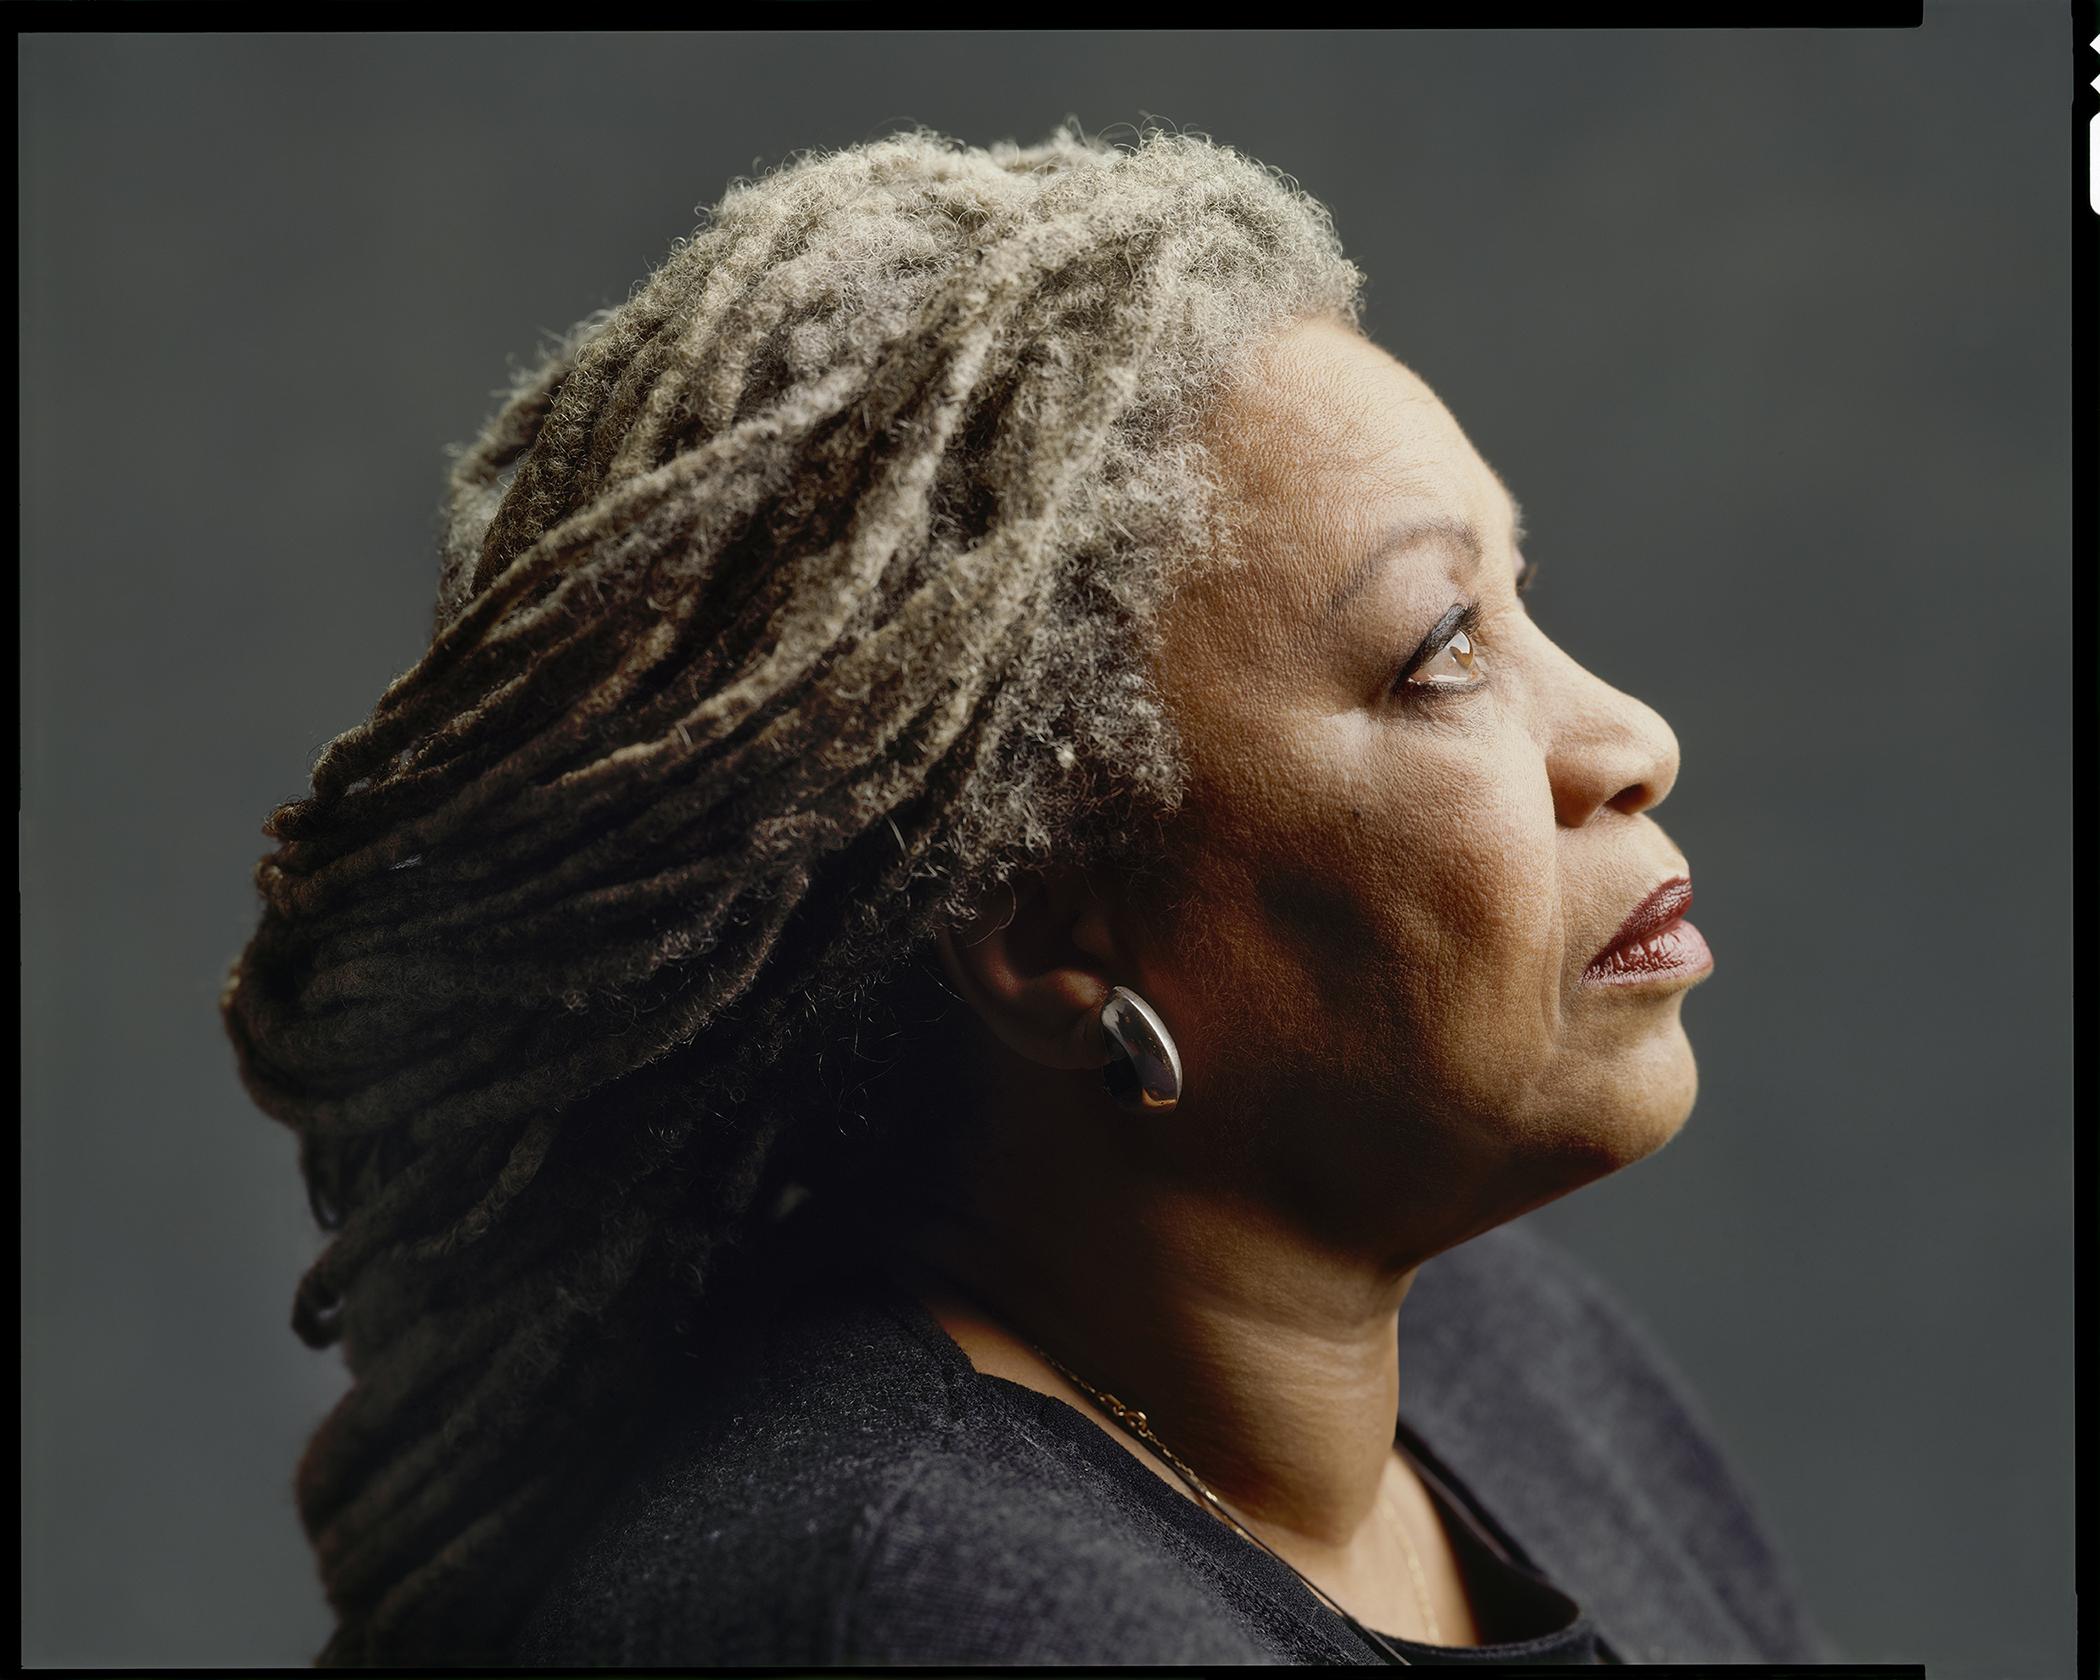 1997-Toni-Morrison-cTimothy-Greenfield-Sanders-1.jpg